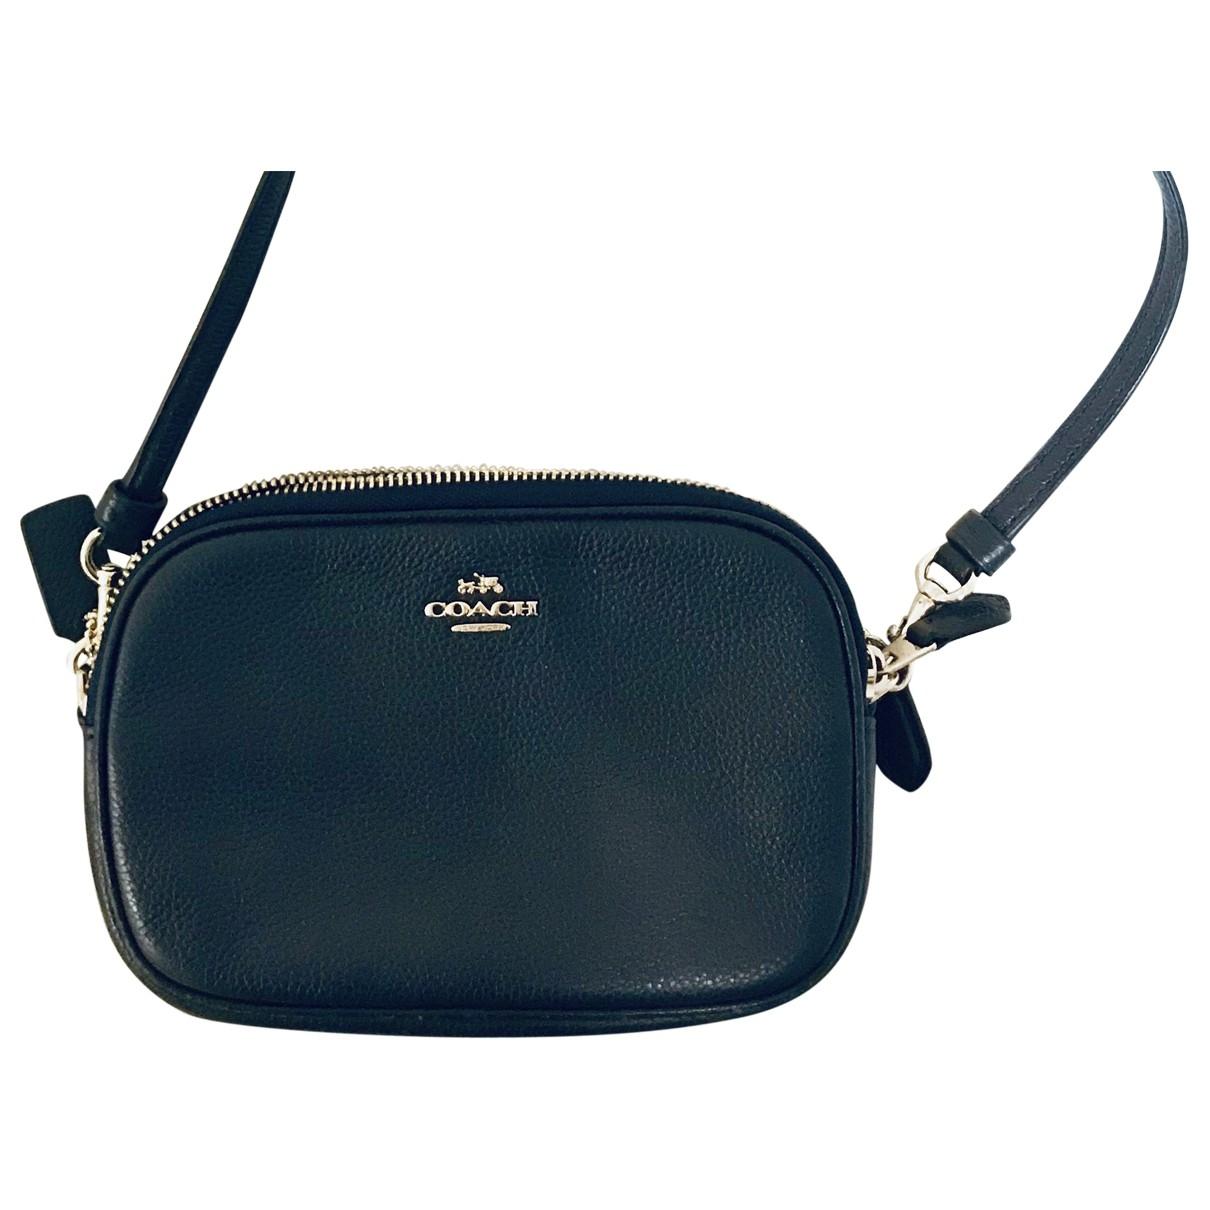 Coach \N Navy Leather Clutch bag for Women \N